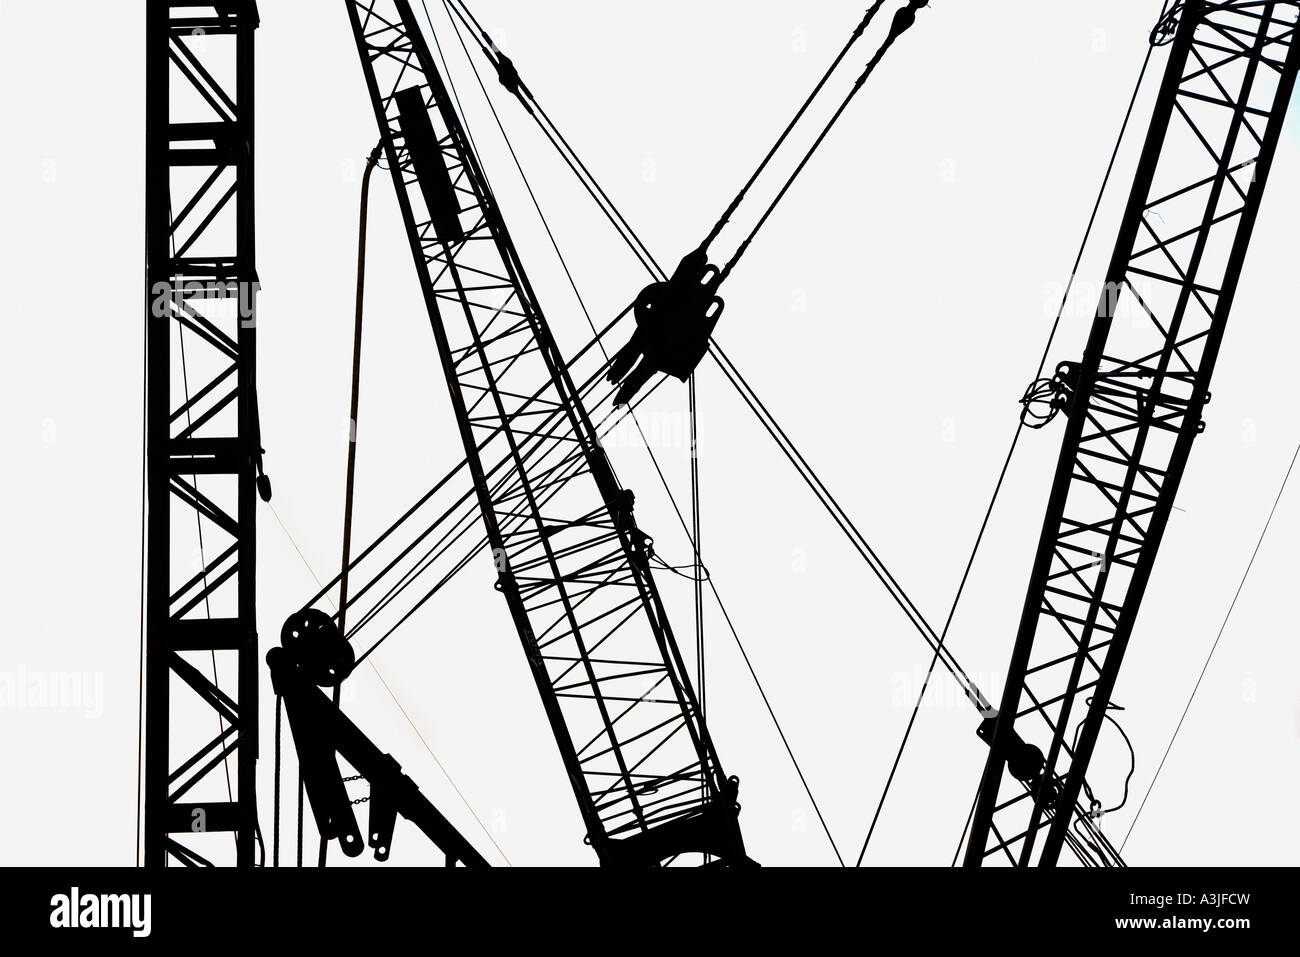 Cranes in silhouette Photo Stock